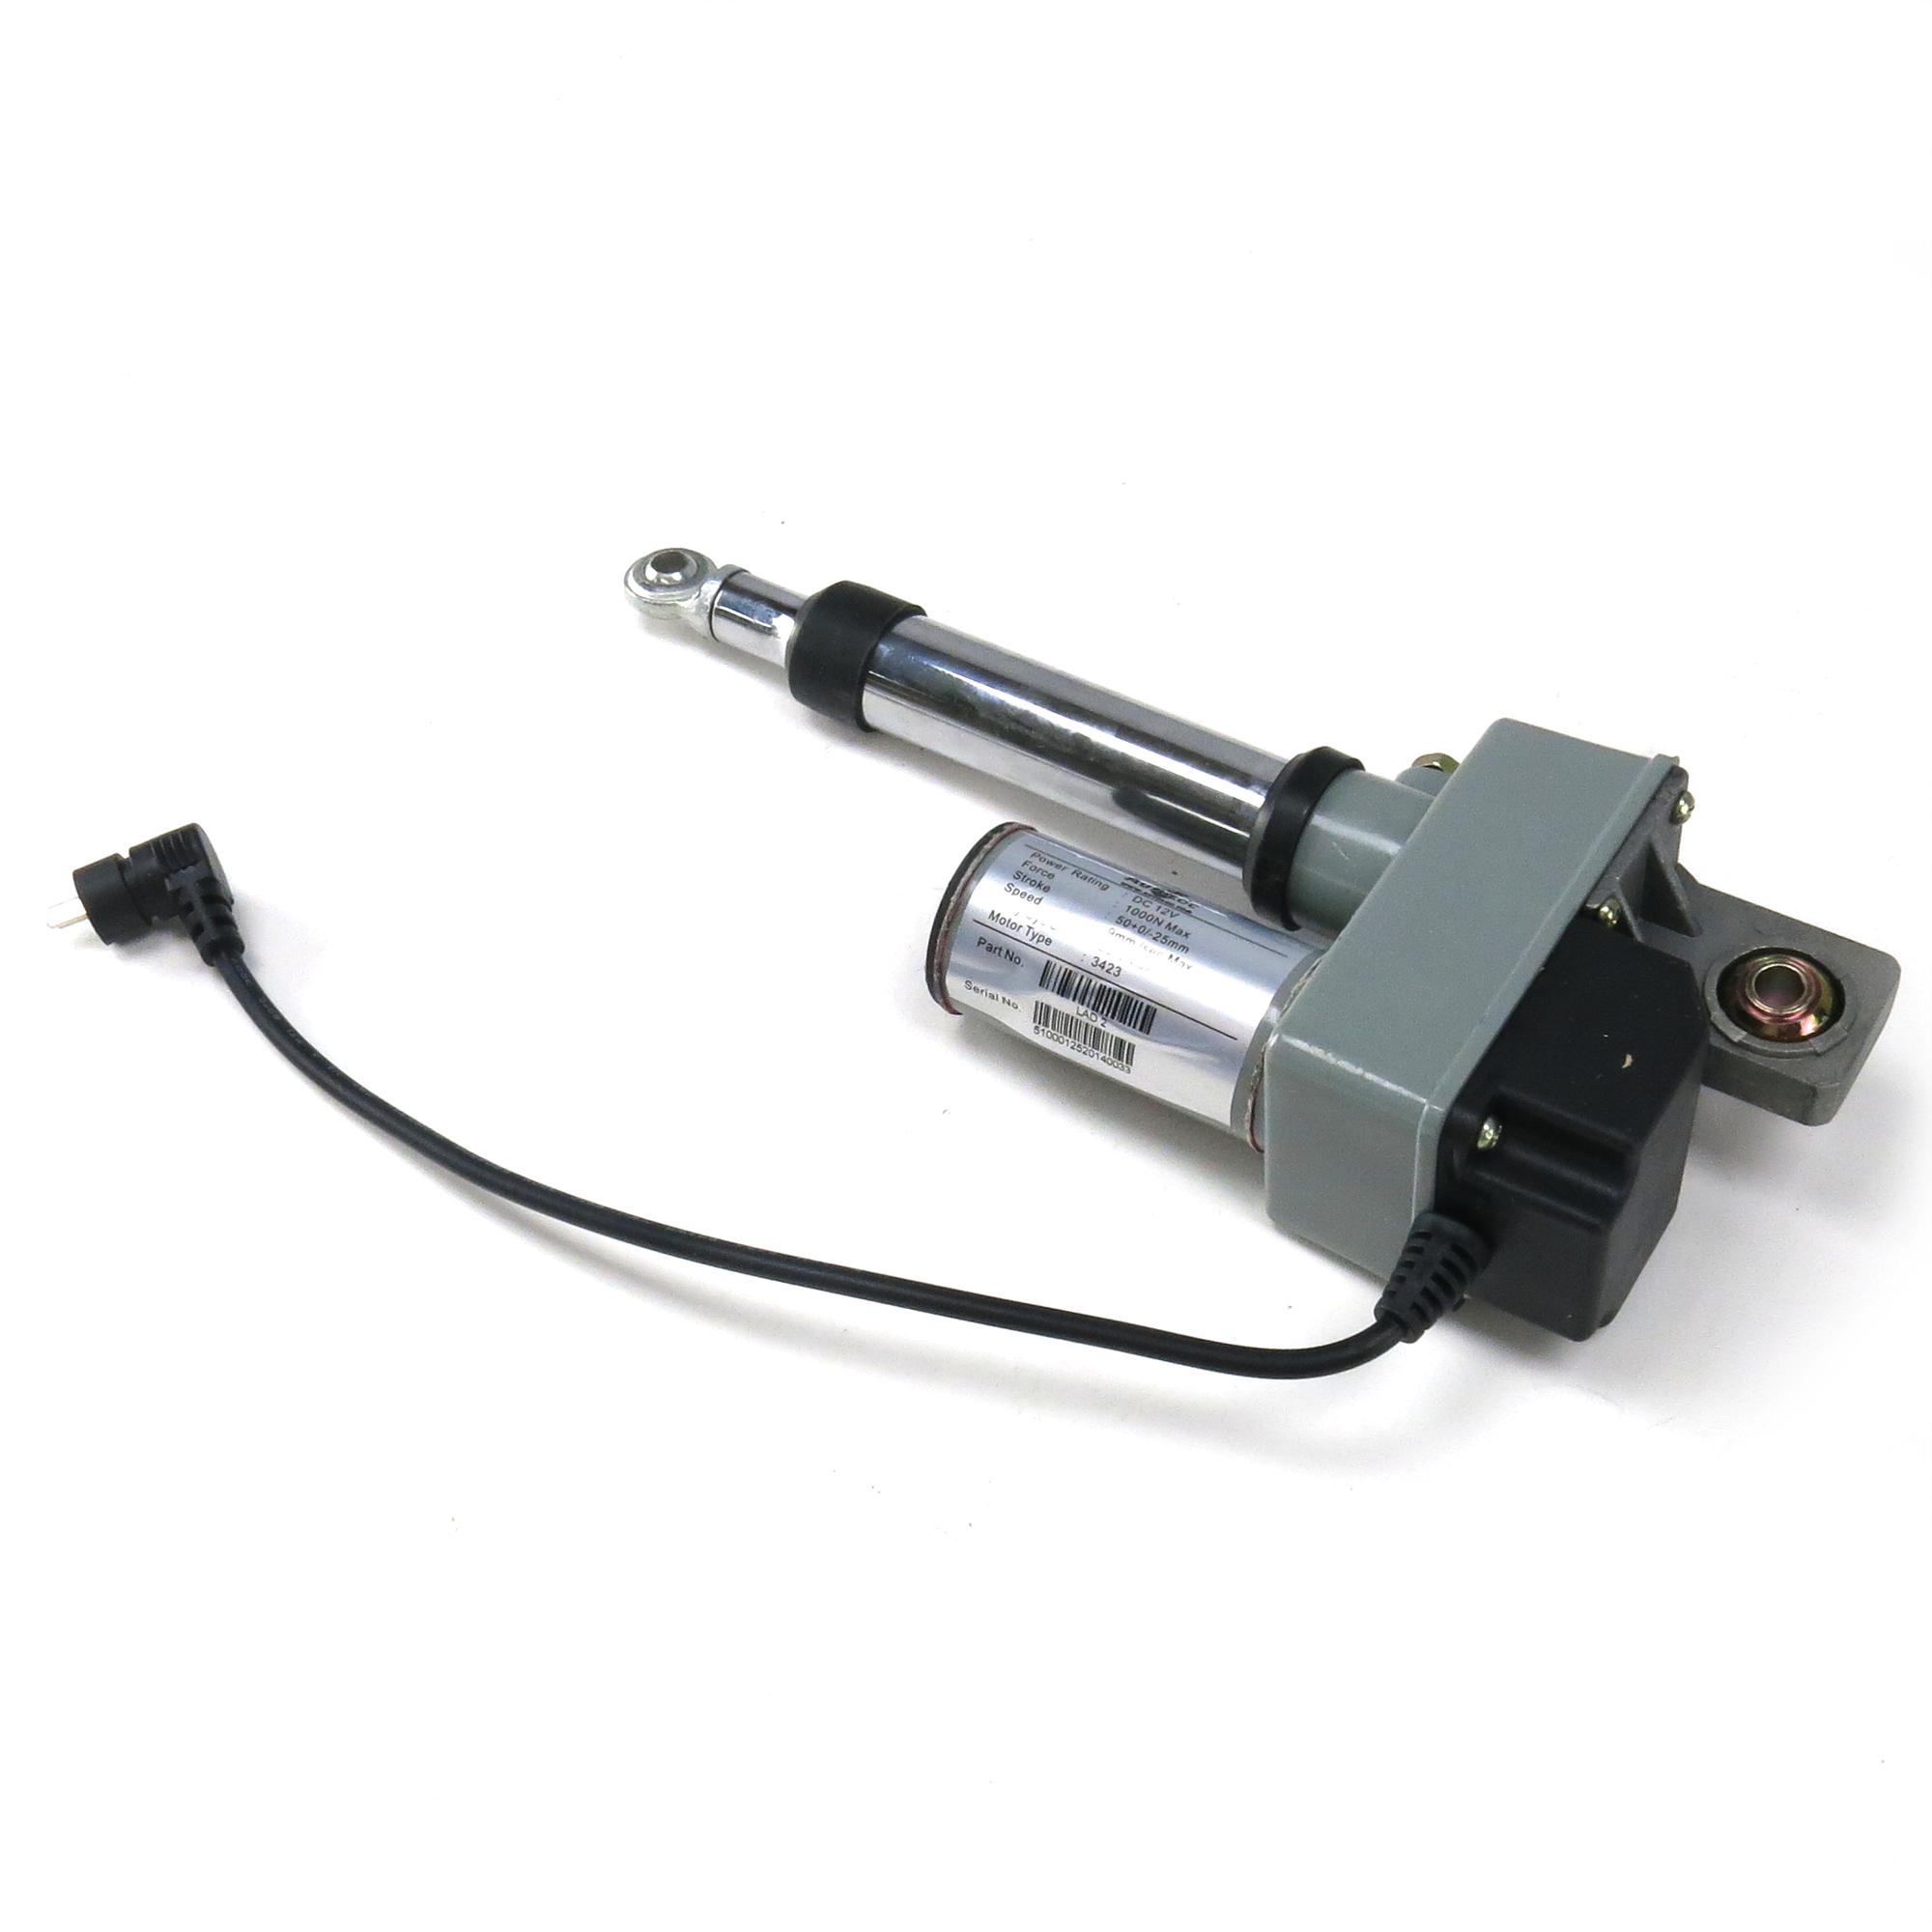 AutoLoc 200 Lb Capacity Autoloc Adjustable Linear Actuator  W/ Rod Bearing